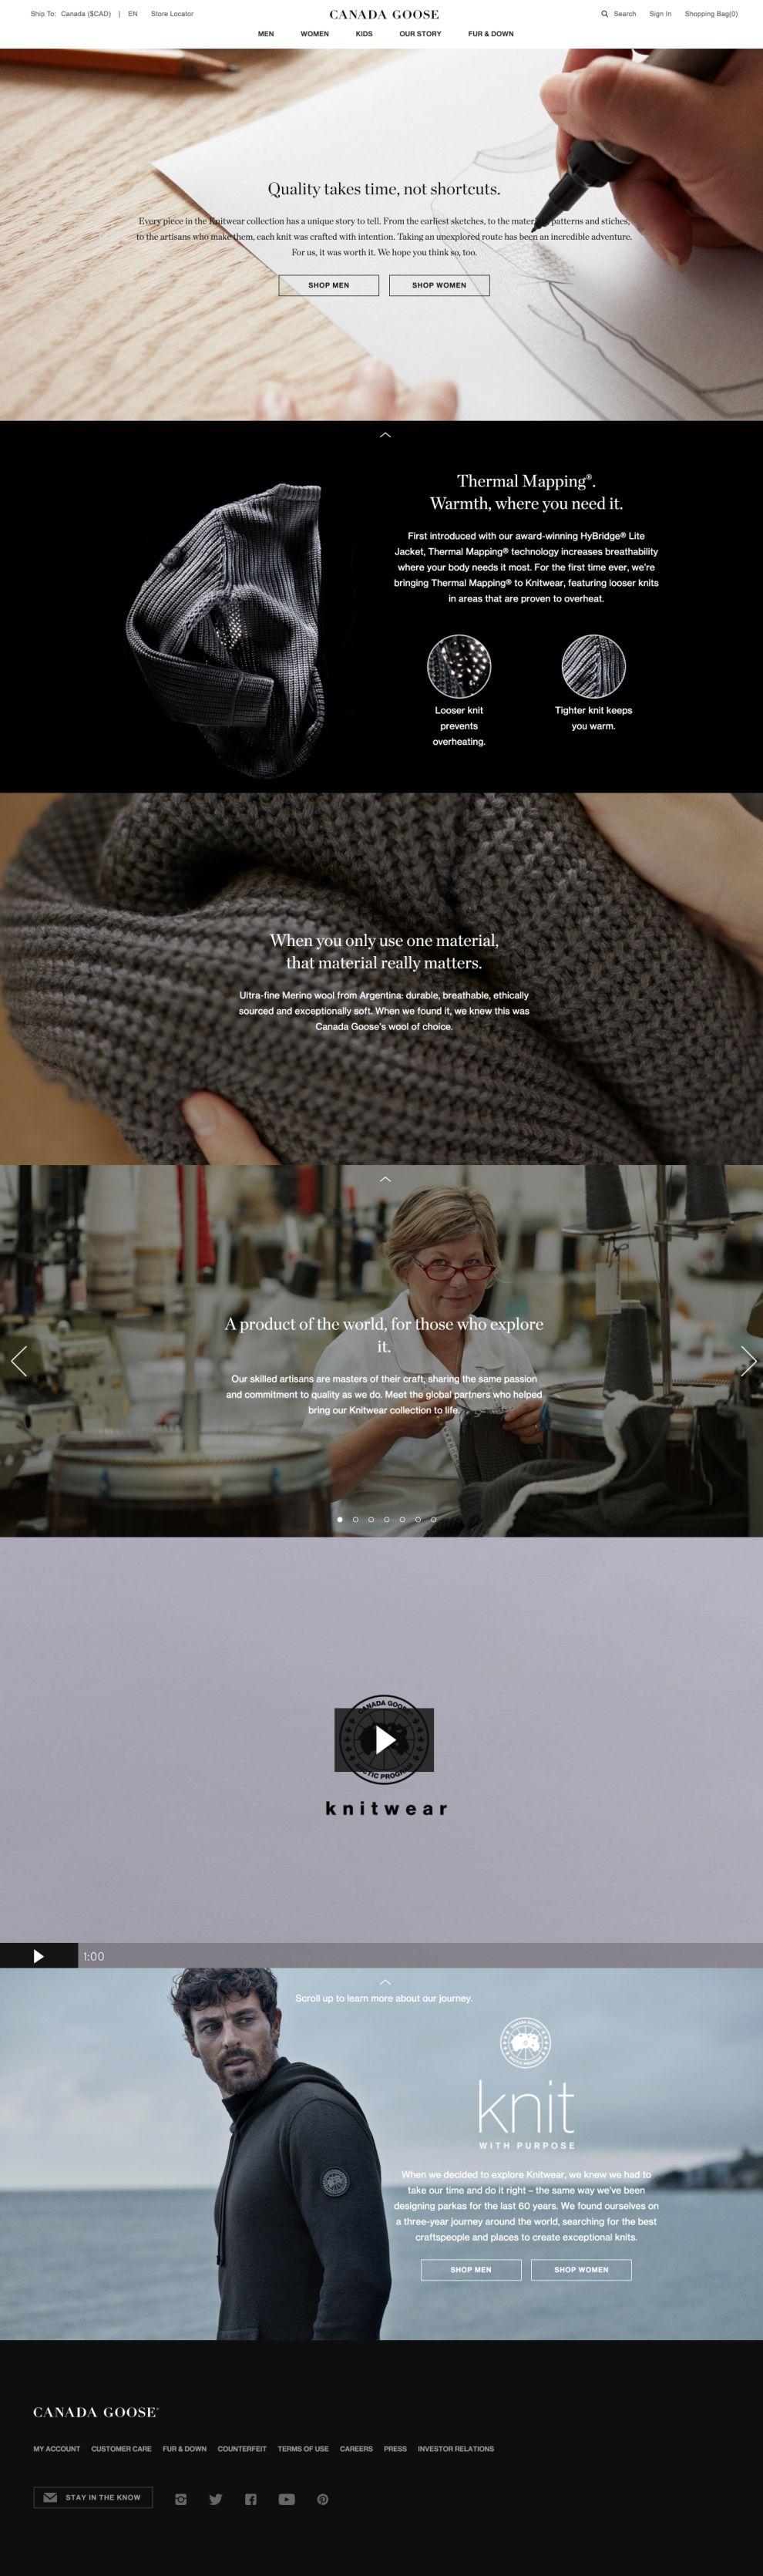 Canada Goose Beautiful Website Design